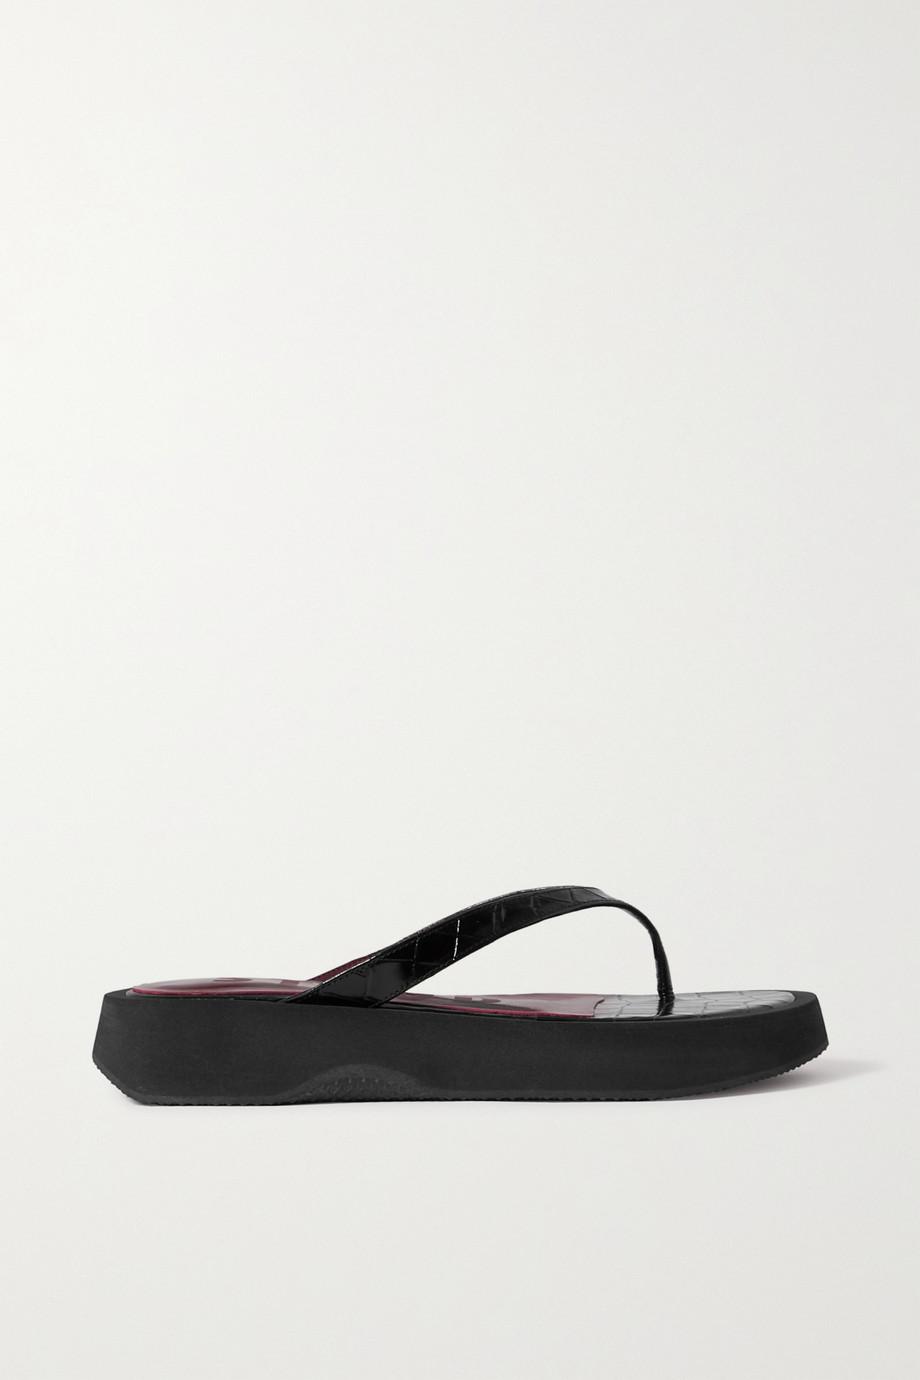 STAUD Tessa croc-effect leather platform flip flops